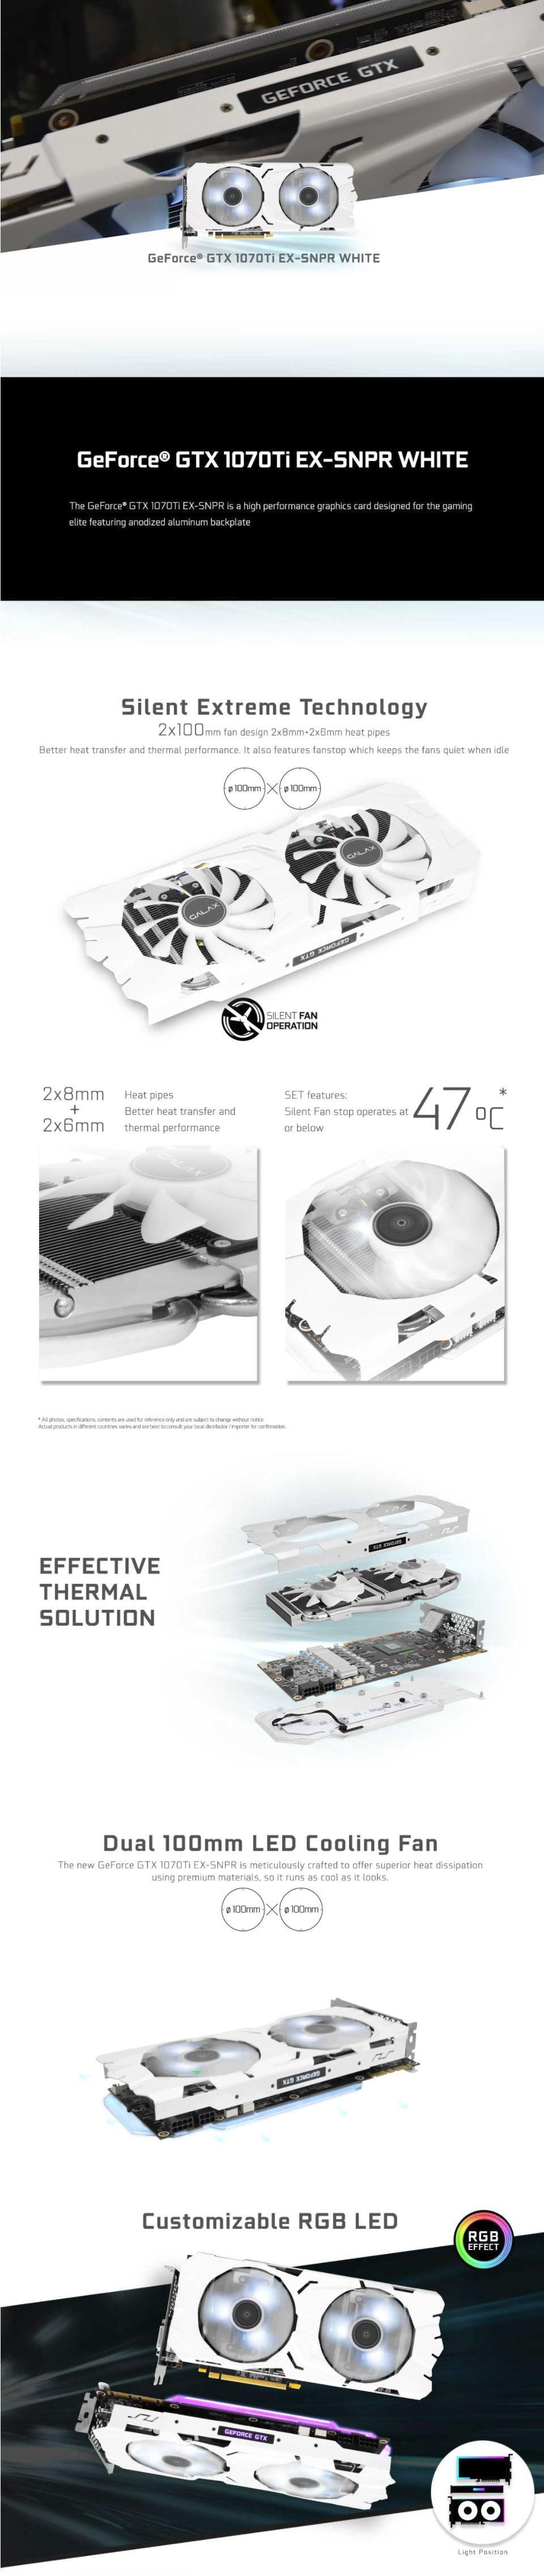 Galax GeForce GTX 1070 Ti EX Sniper White 8GB [GTX1070TI-EX-SNPR